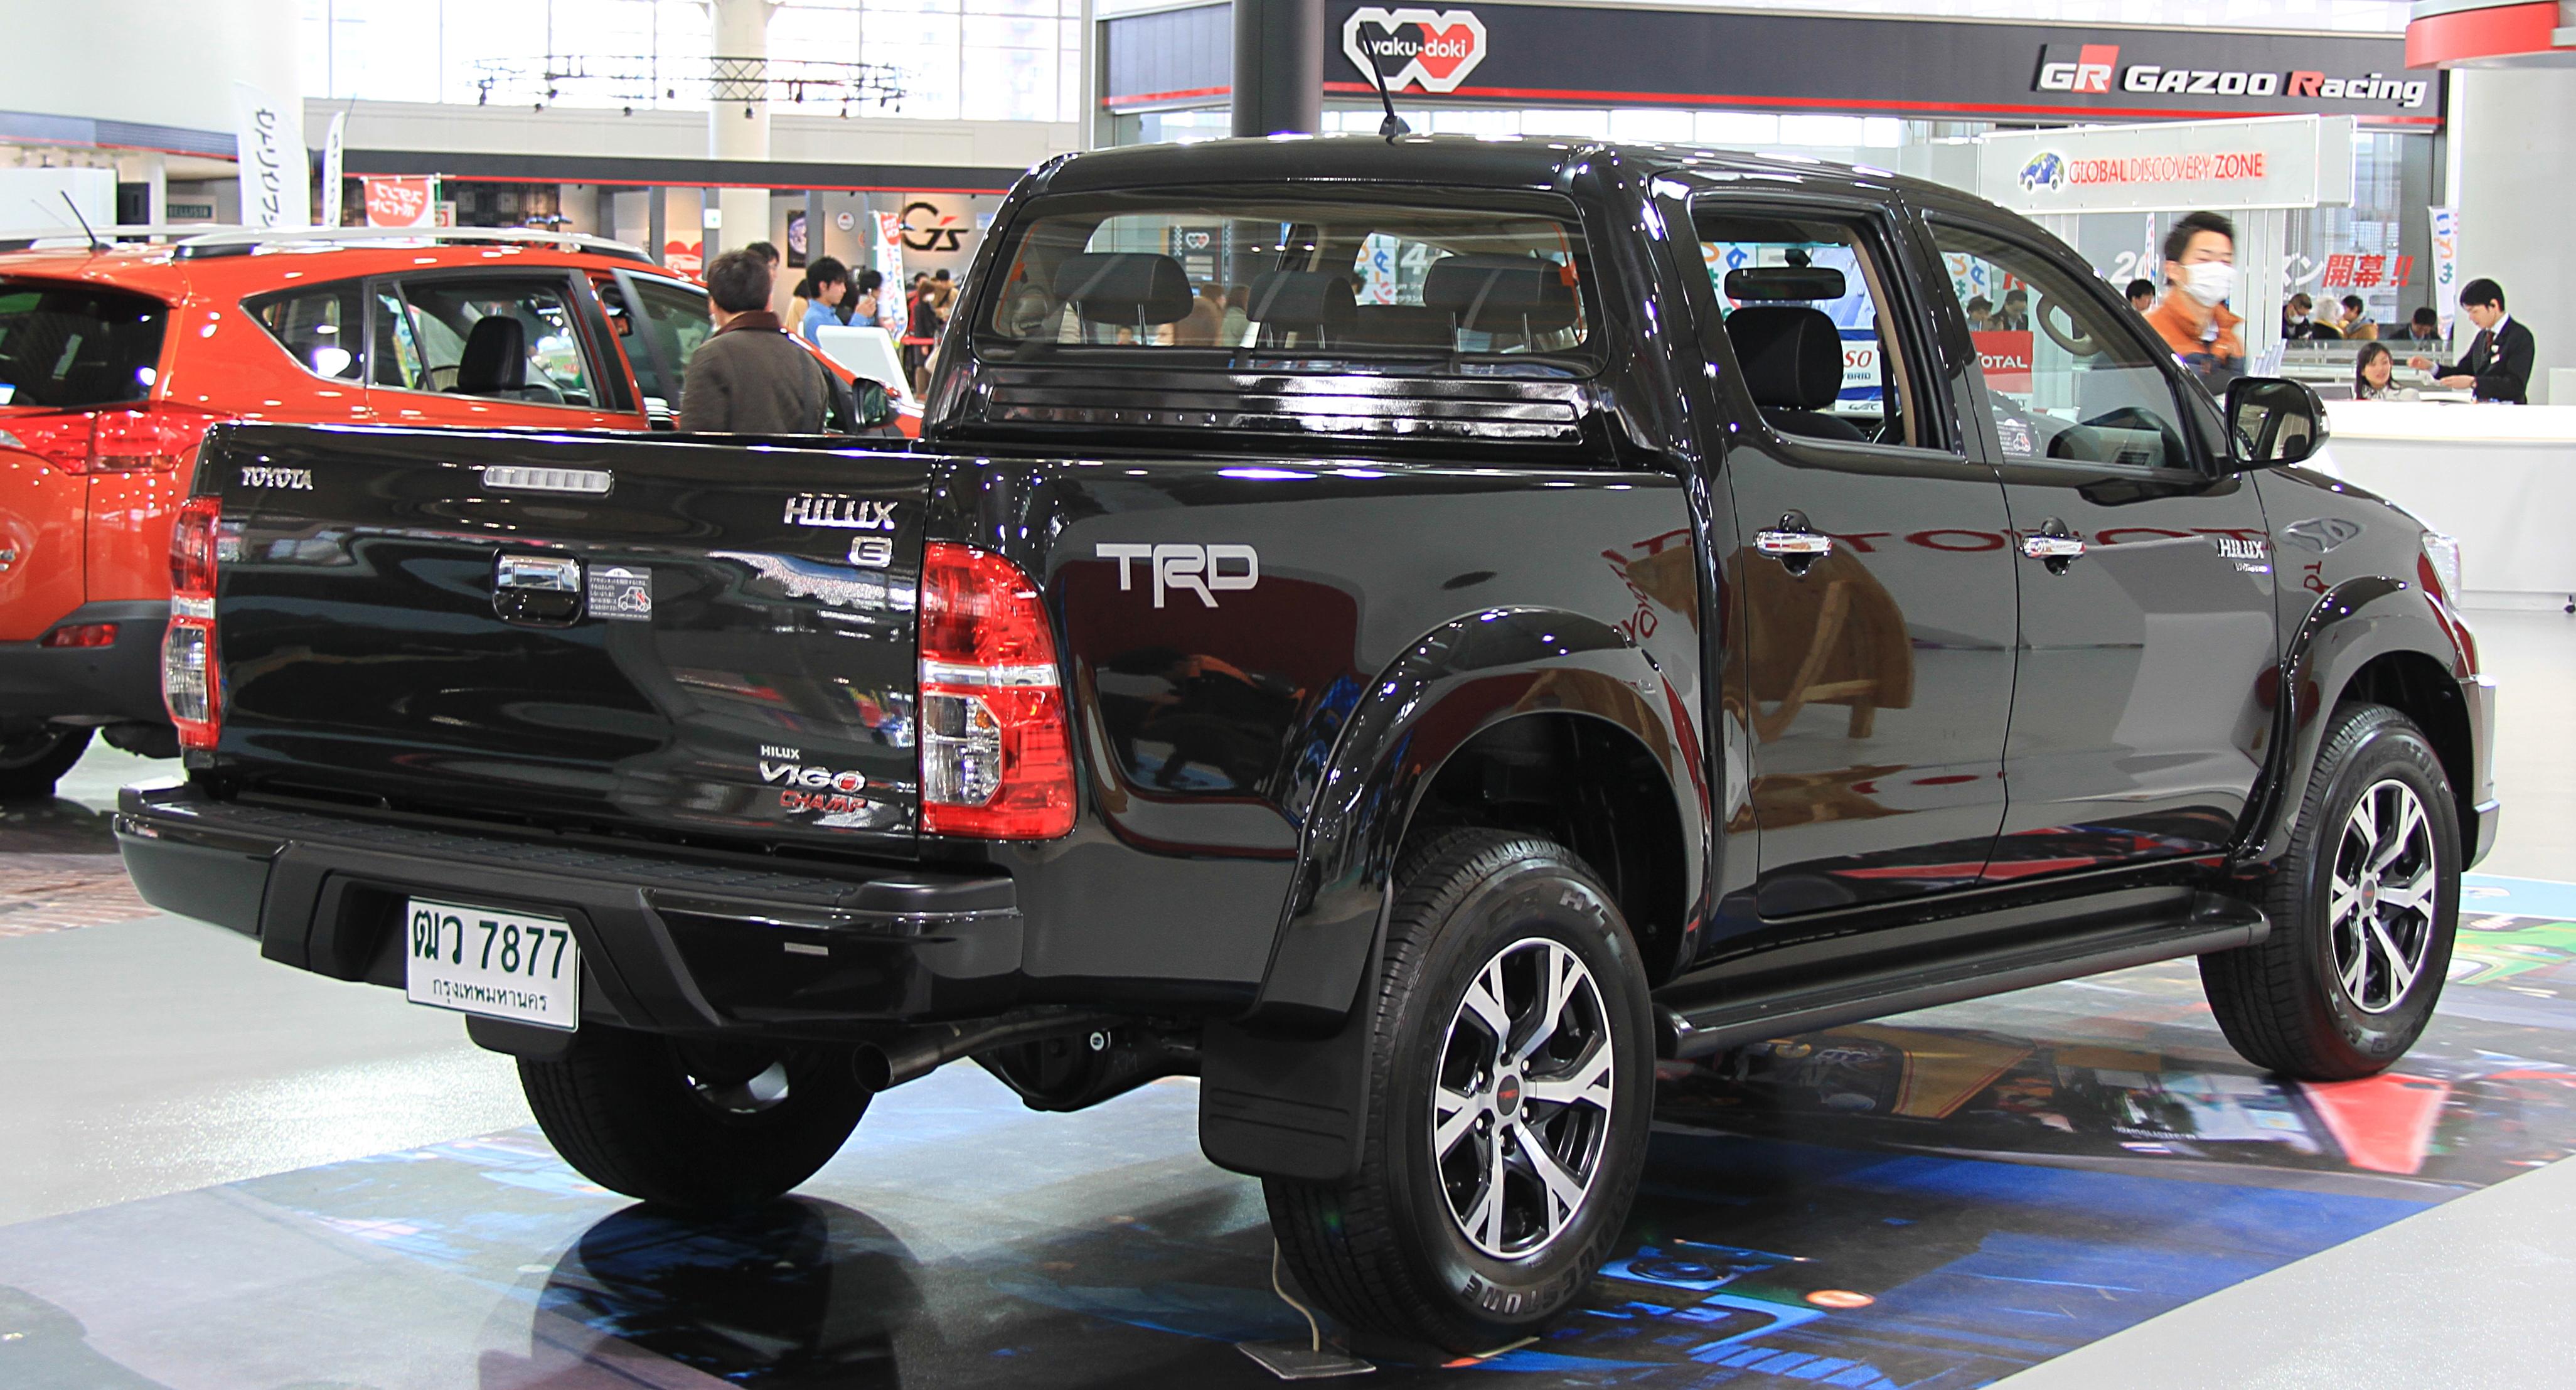 File:Toyota Hilux Vigo Champ TRD rear.jpg